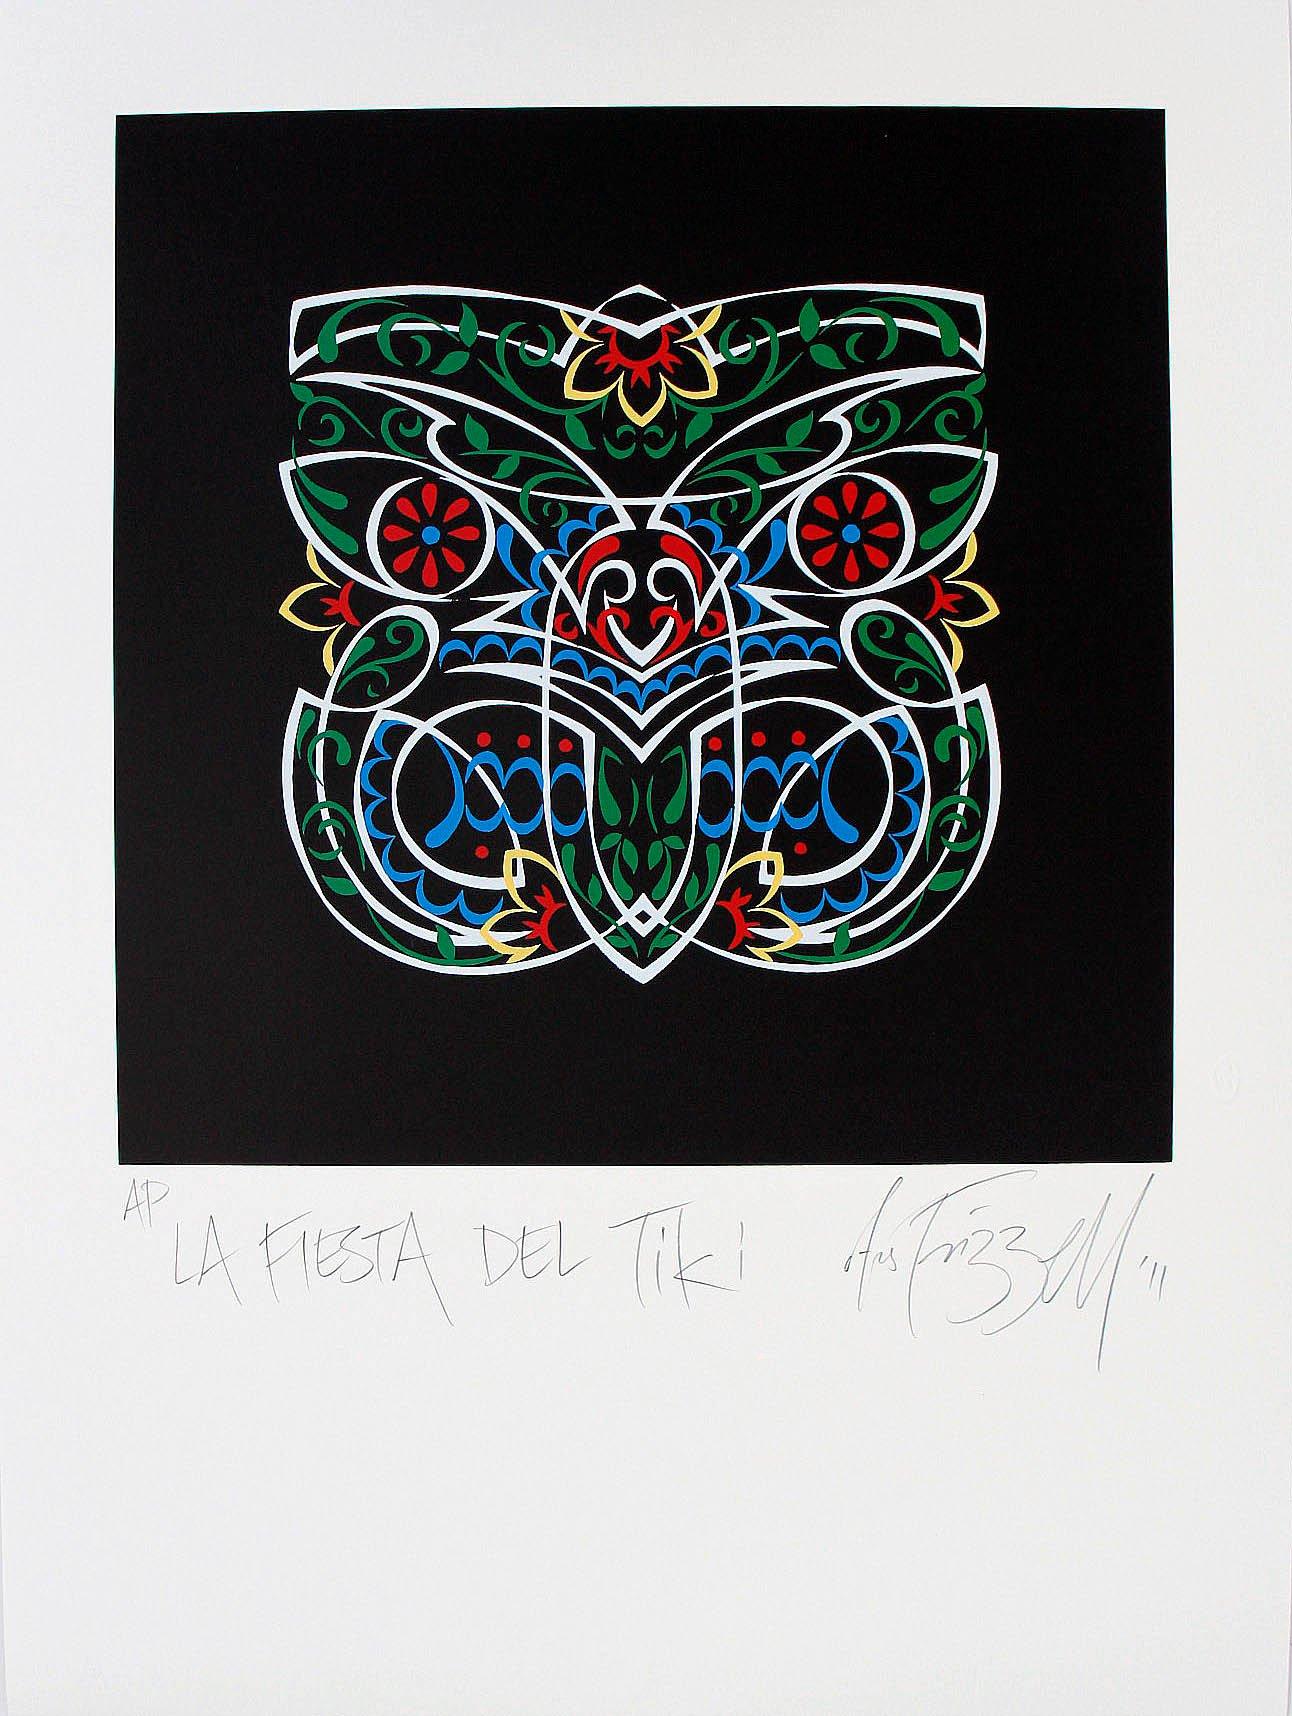 Otis Frizzell     - new screen print...      'La Fiesta Del Tiki'     MexiHori Folk Art mash-up...   The full fruit...    <<< 'AP' added to the ARTIVIST collection